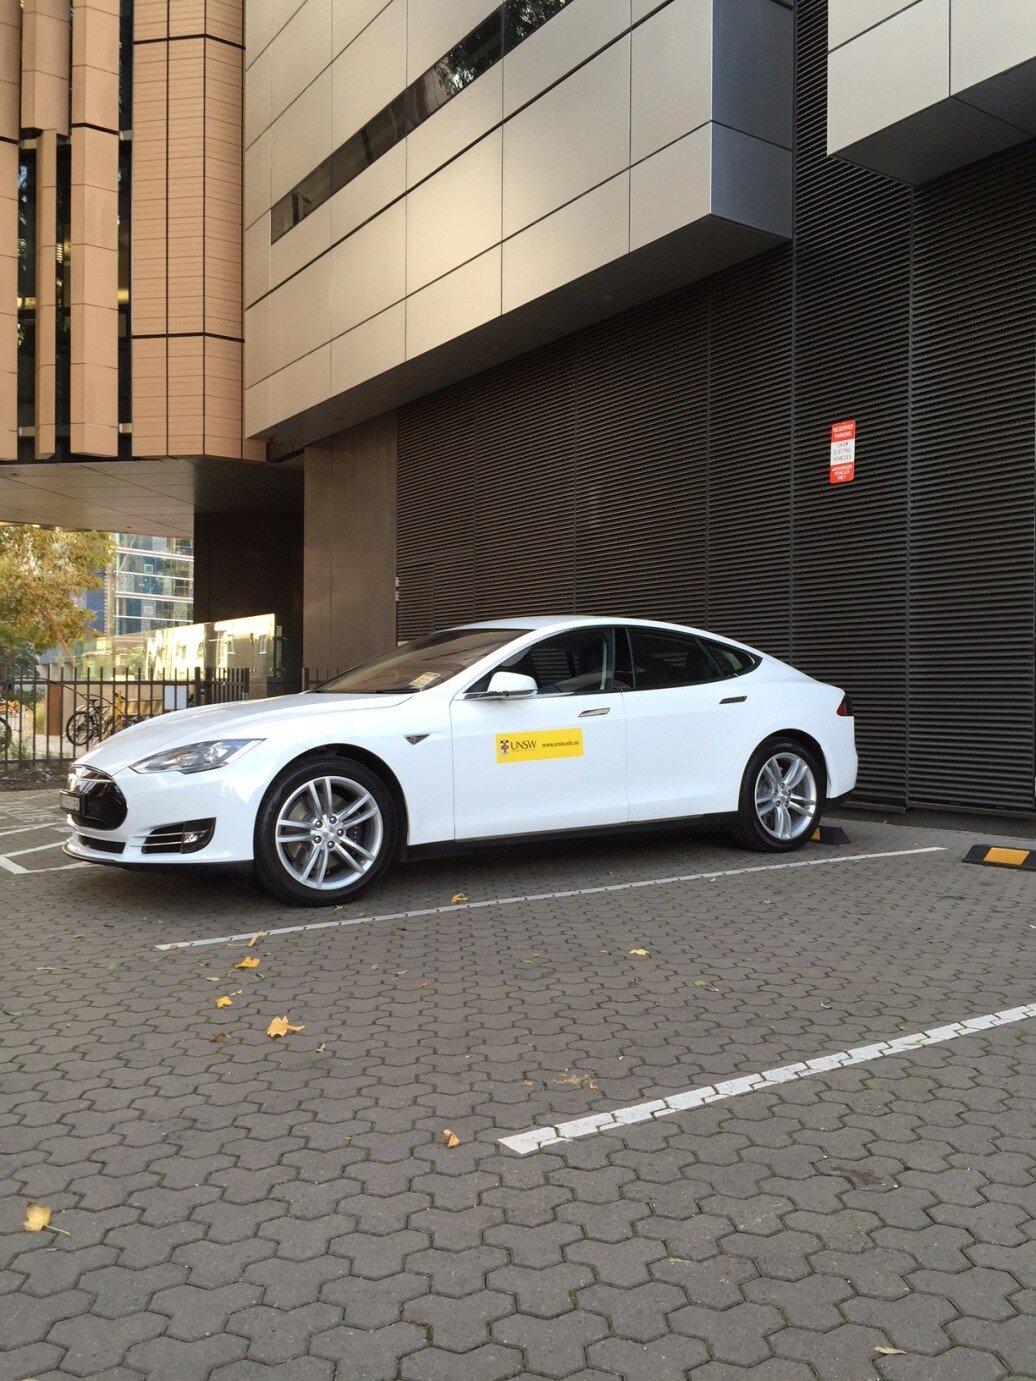 UNSW Tesla Model S